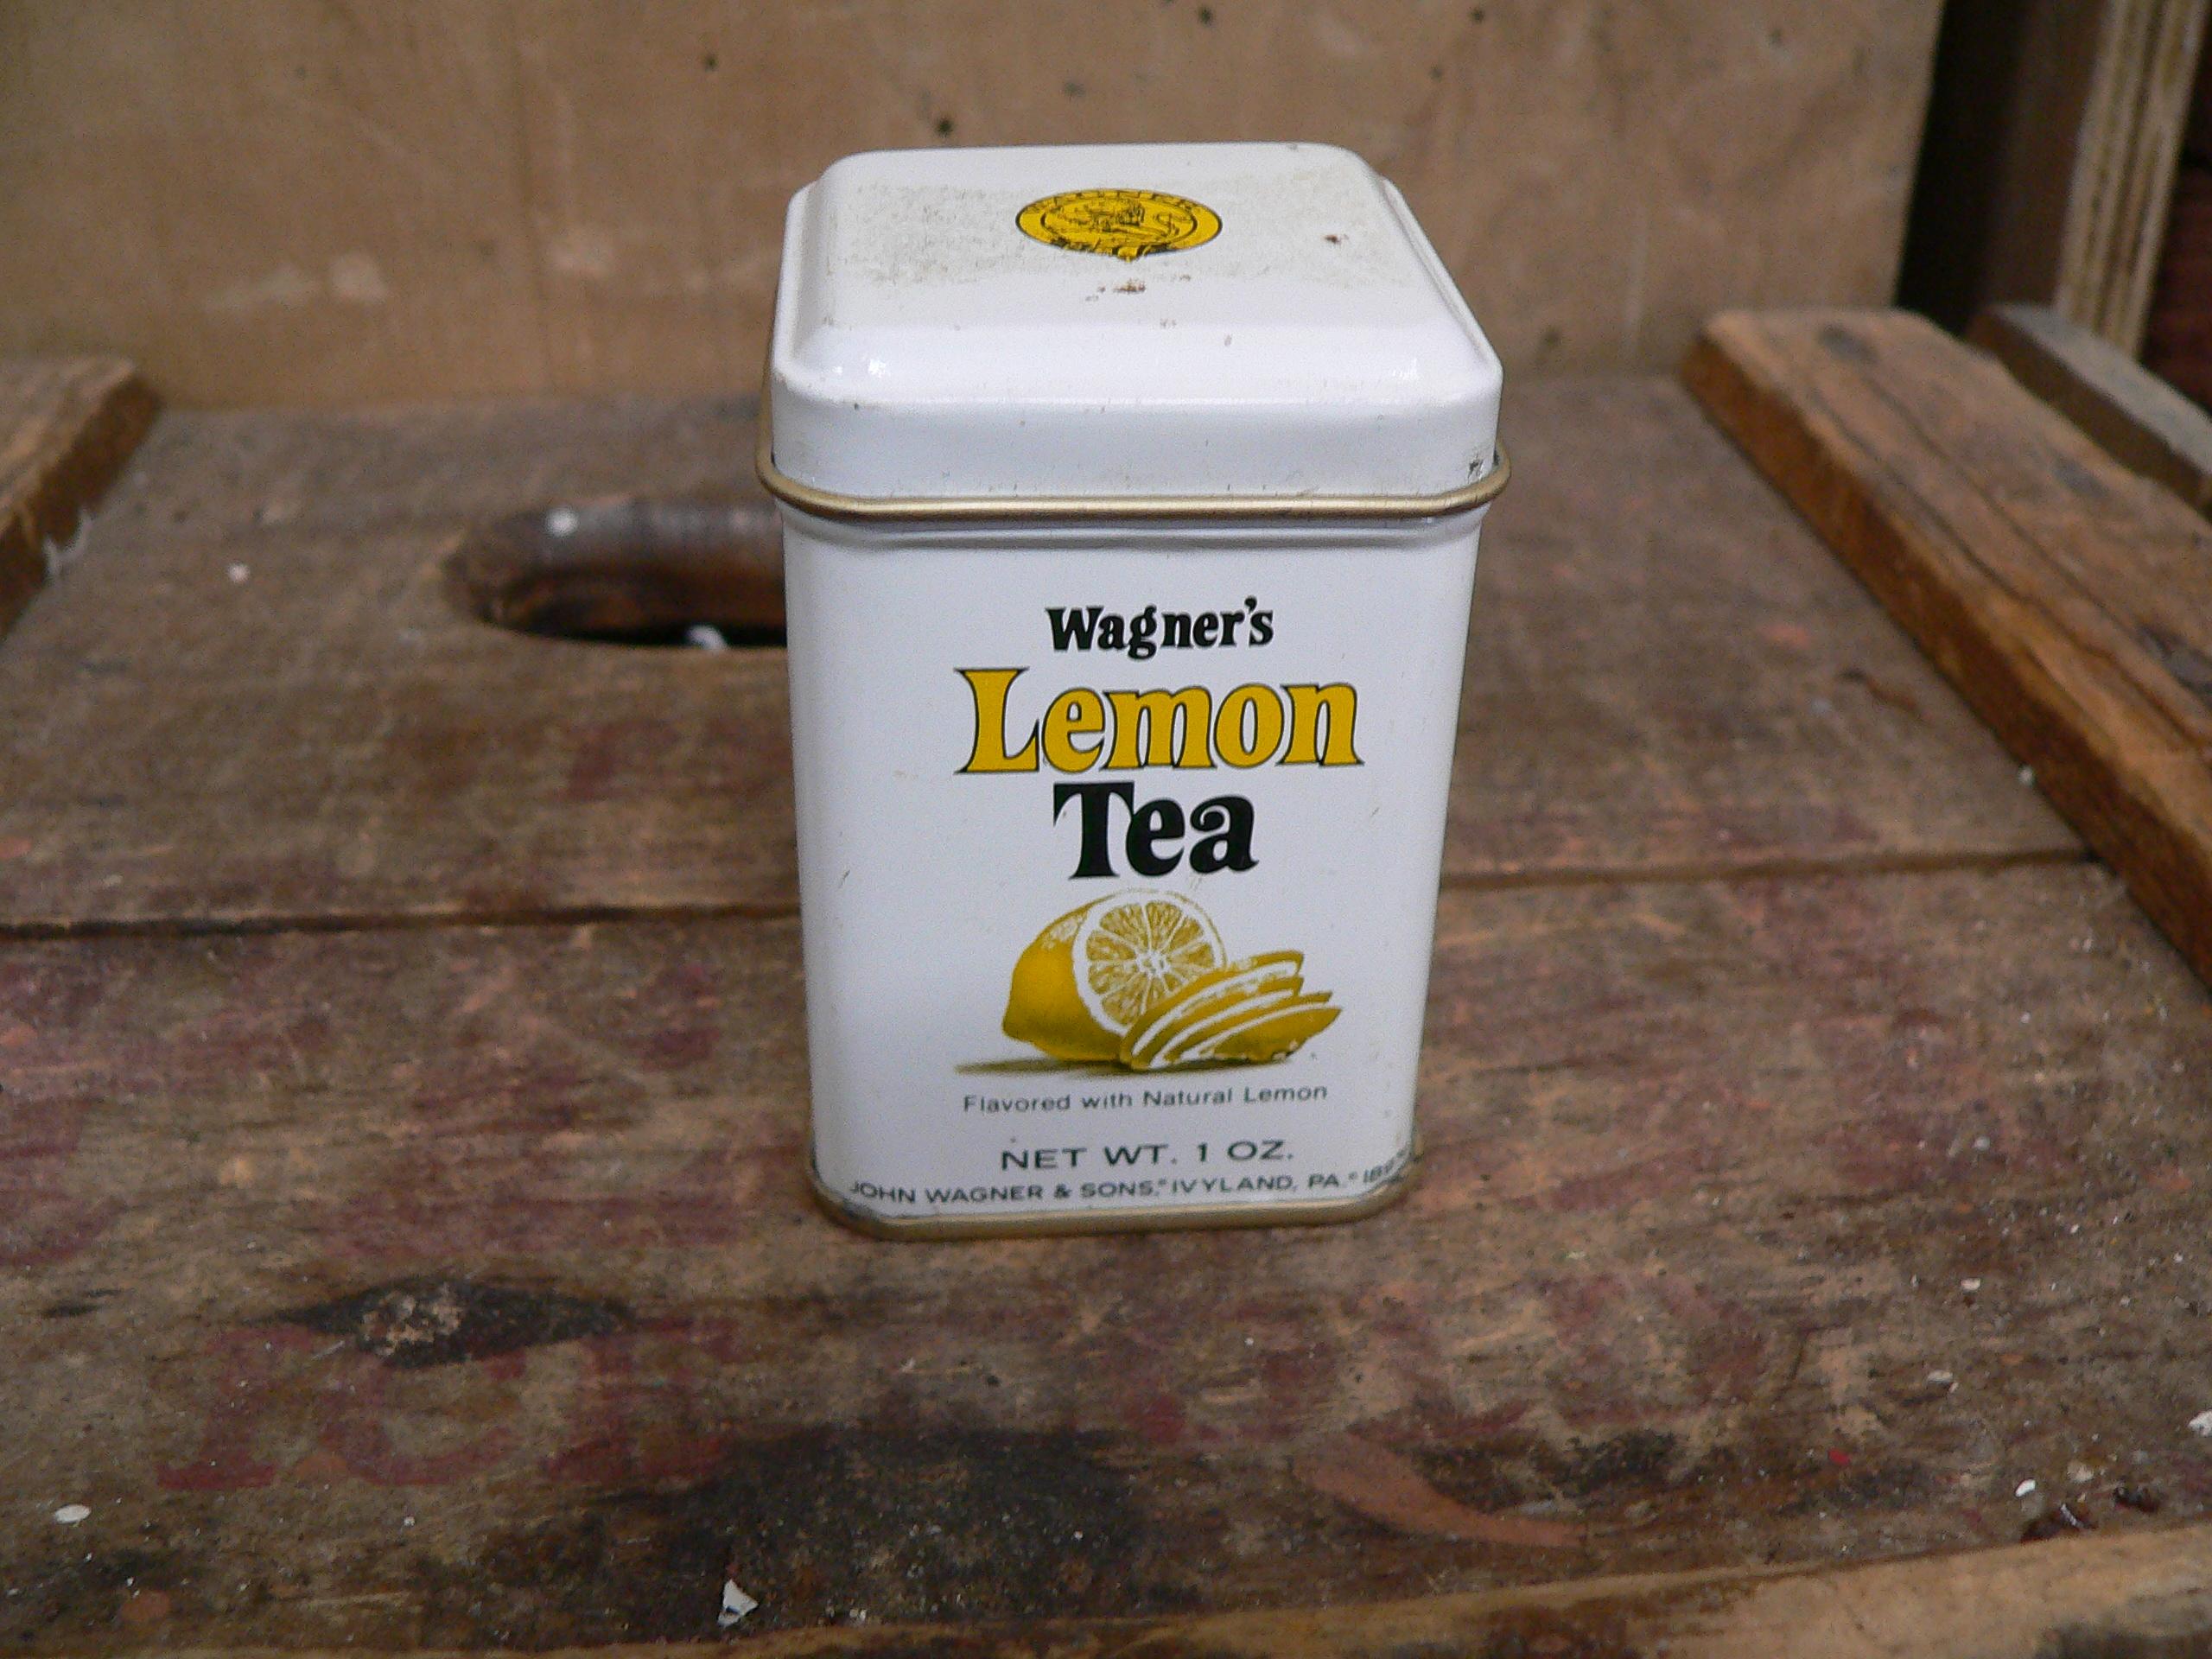 Canne wagner's lemon tea # 6208.3